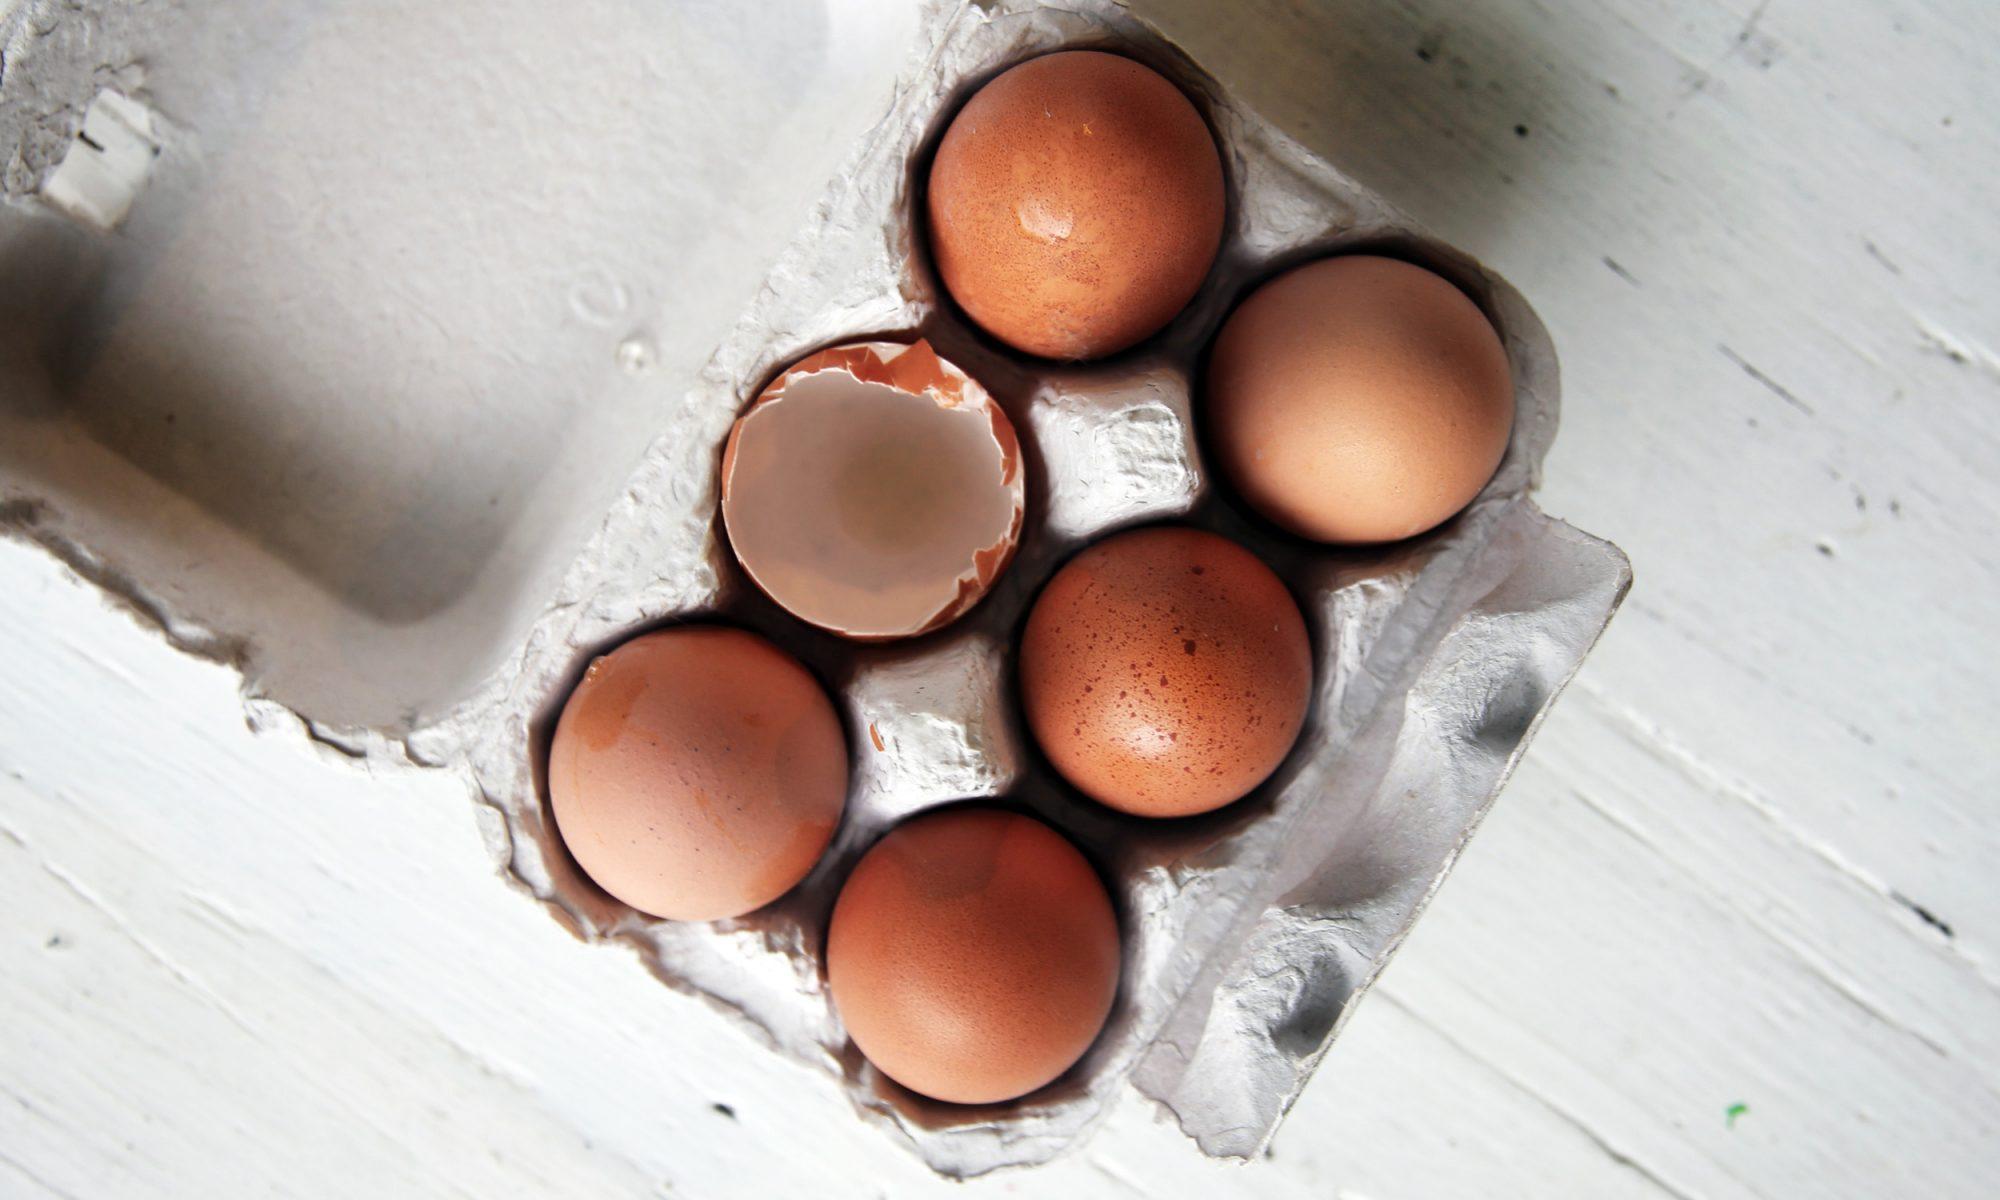 EC: Dutch Farm Claims to Produce First CO2-Neutral Egg